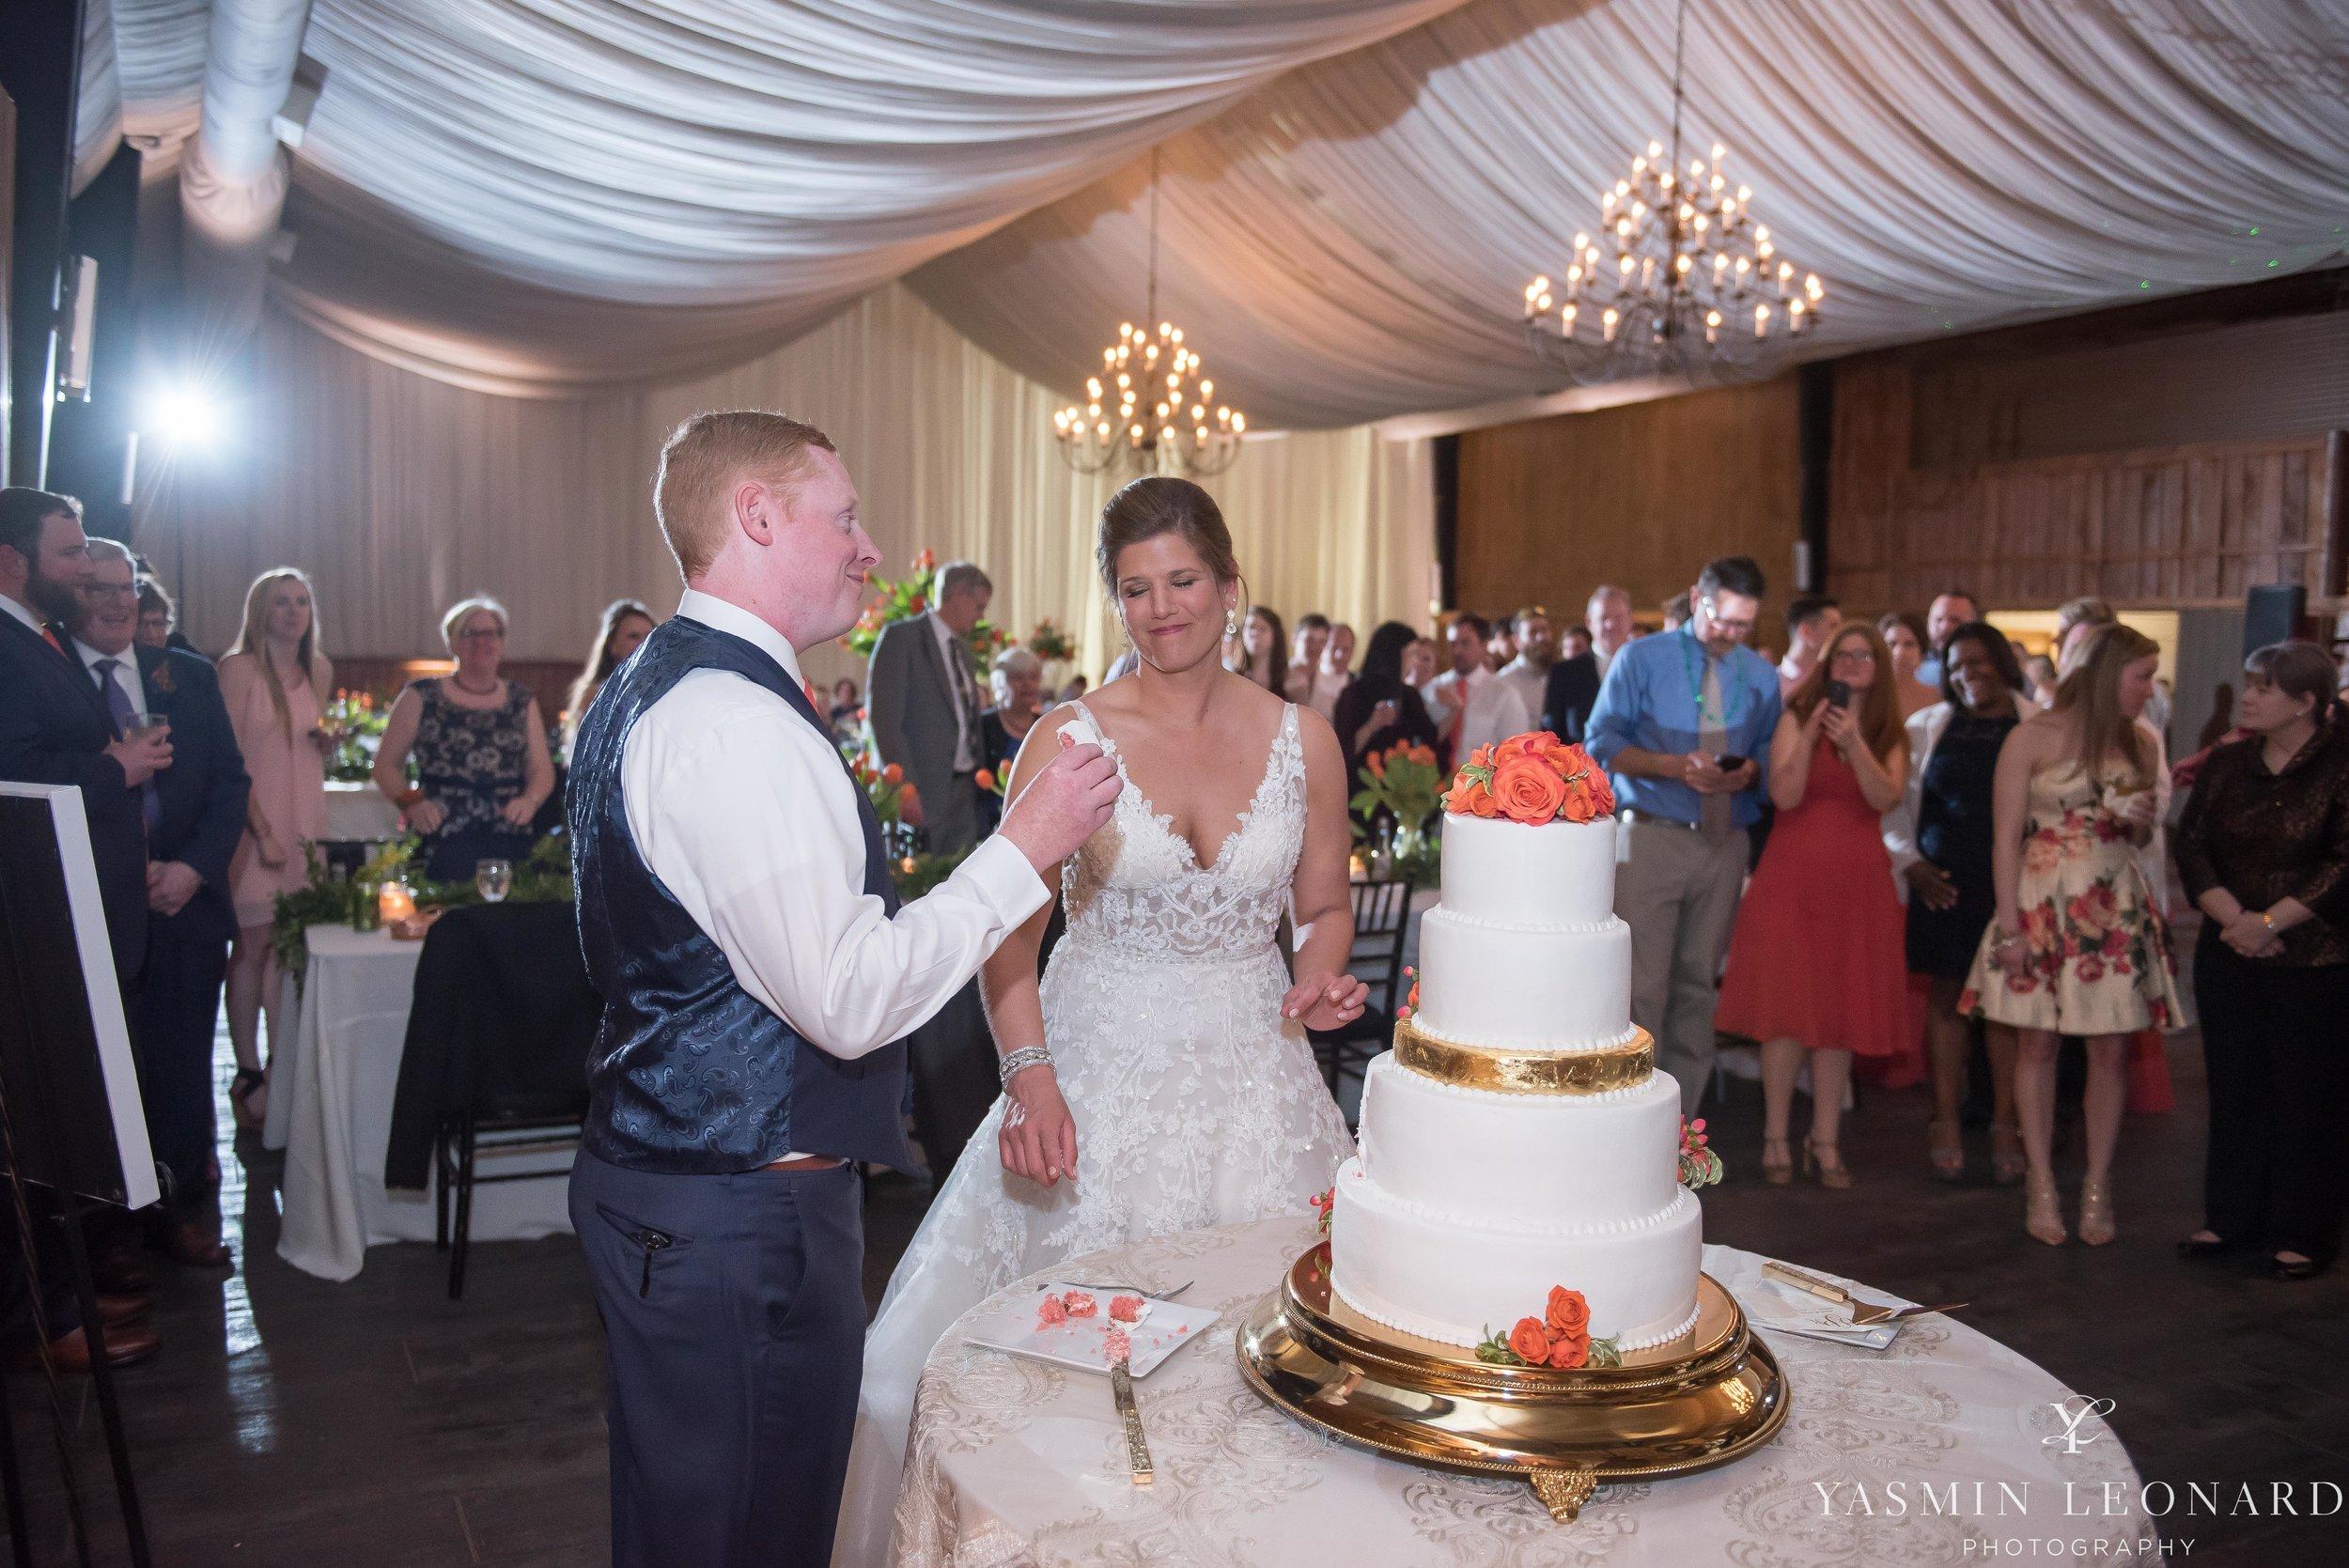 Adaumont Farm - Adaumont Farm Weddings - Trinity Weddings - NC Weddings - Yasmin Leonard Photography-81.jpg